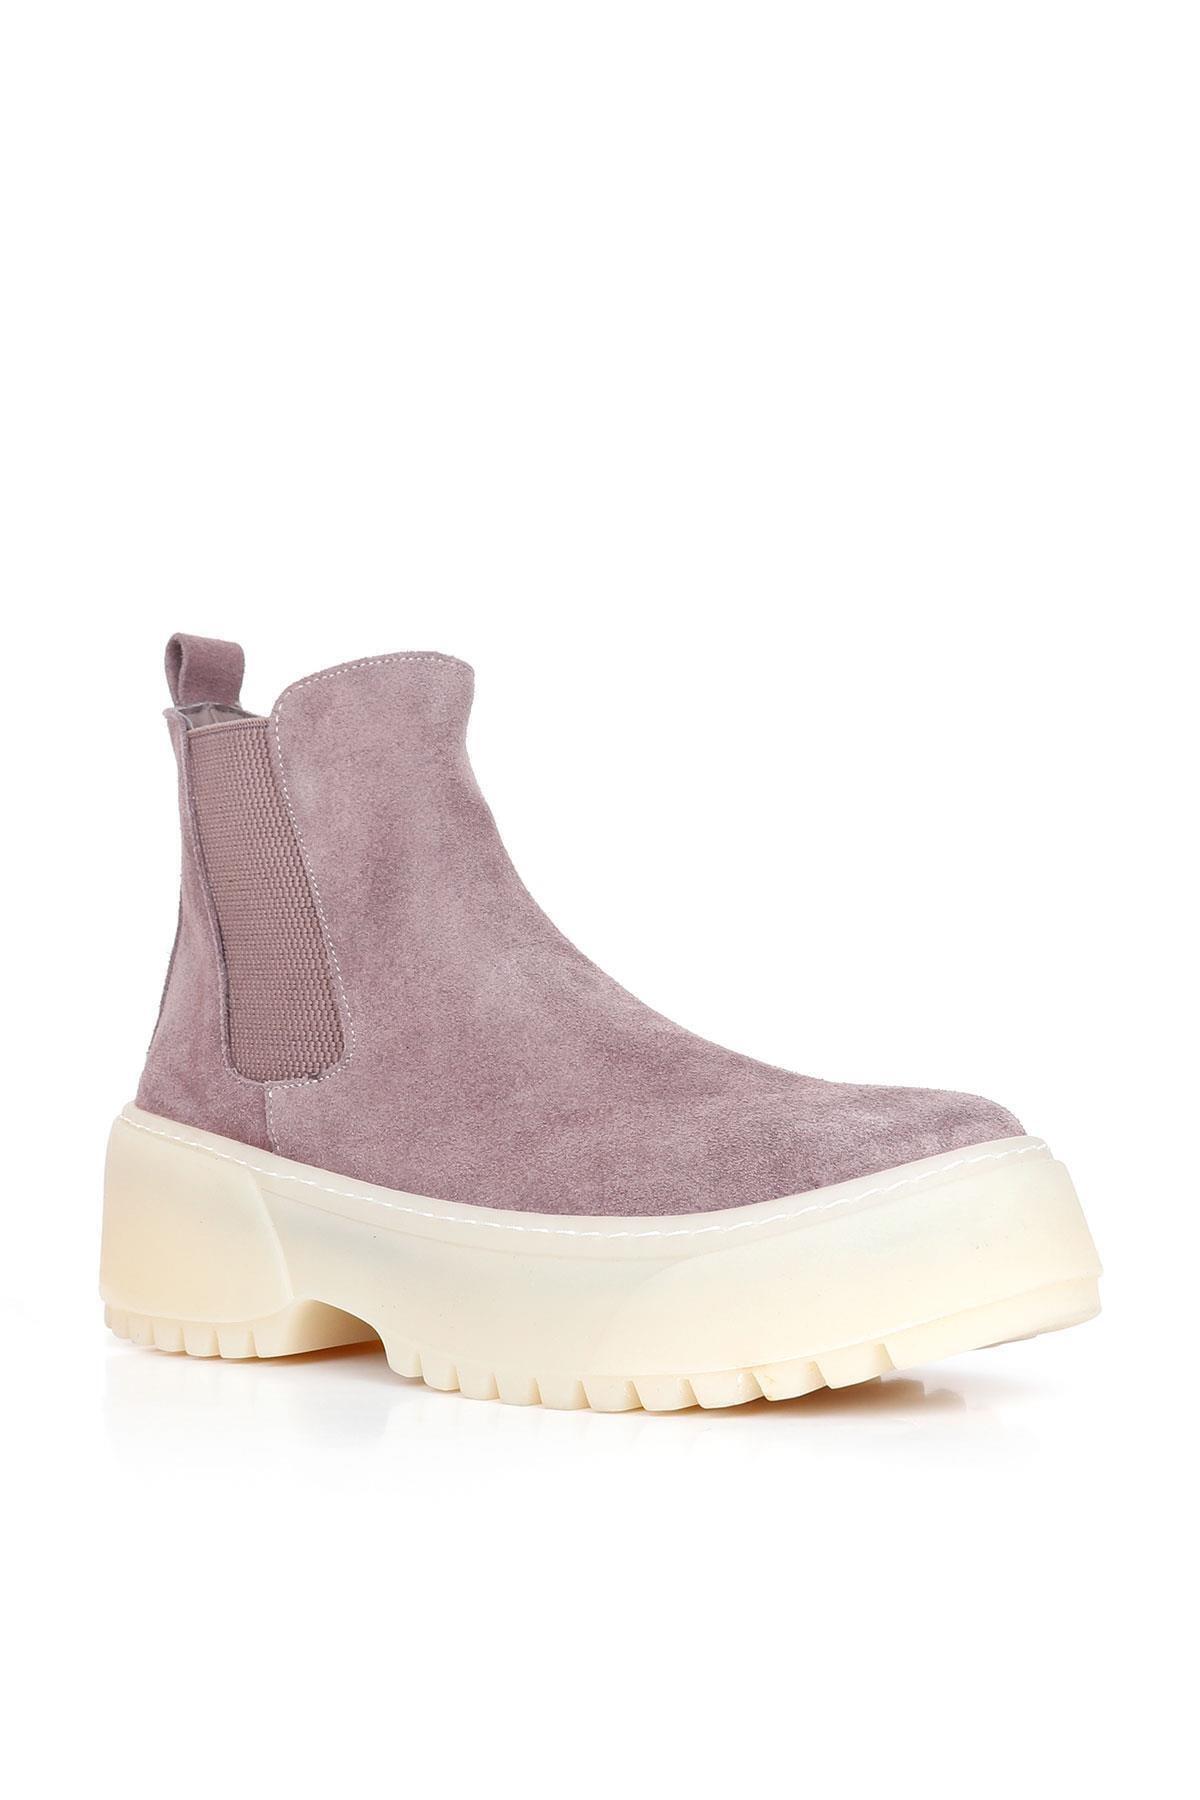 BUENO Shoes Hakiki Deri Kadın Dolgu Topuk Bot 01wr4701 2